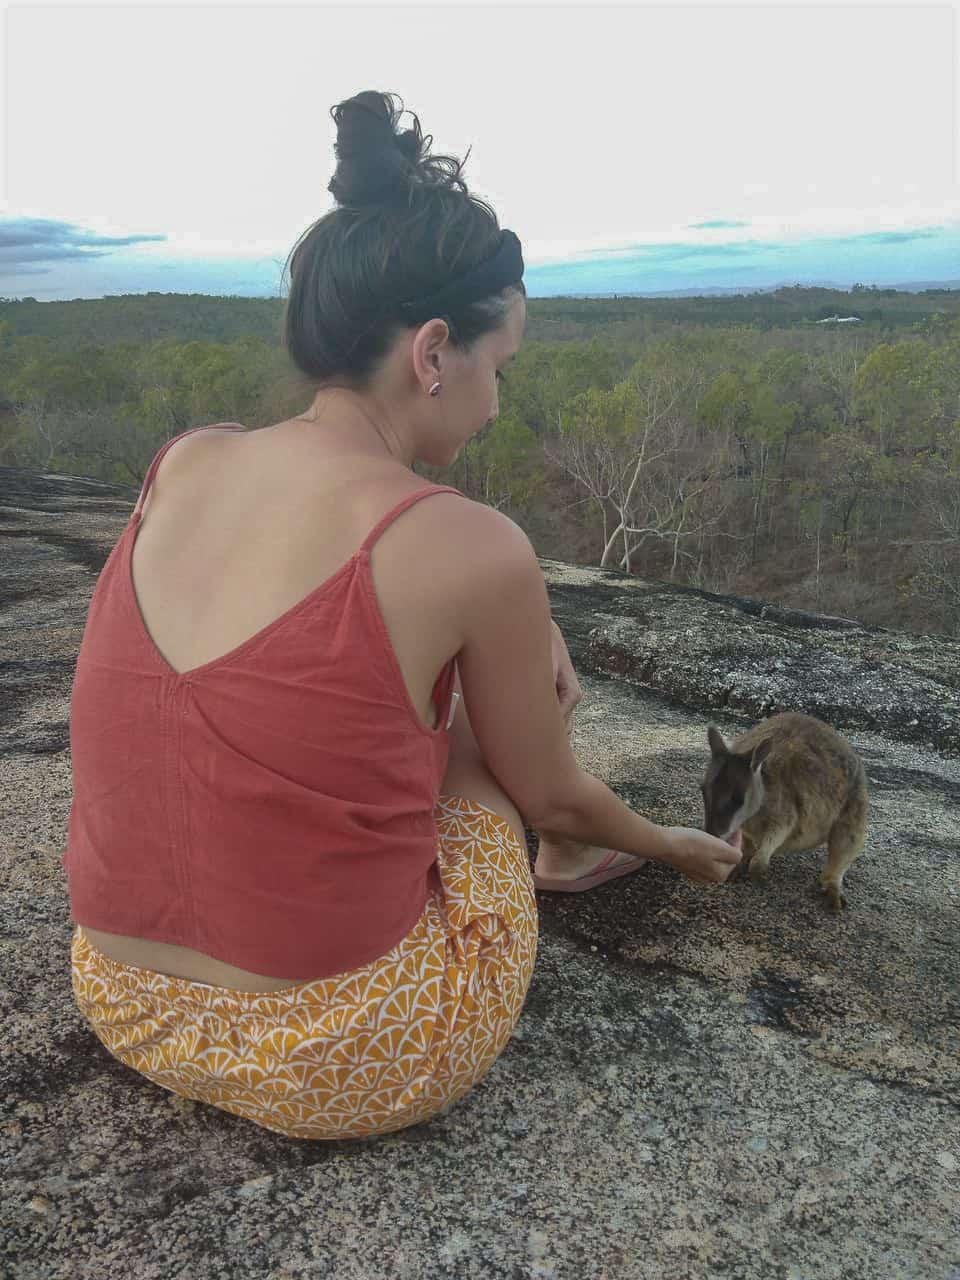 Granite-Gorge-Wallabies-Atherton-Tablelands-North-Queensland-Australia ] Travel Mermaid